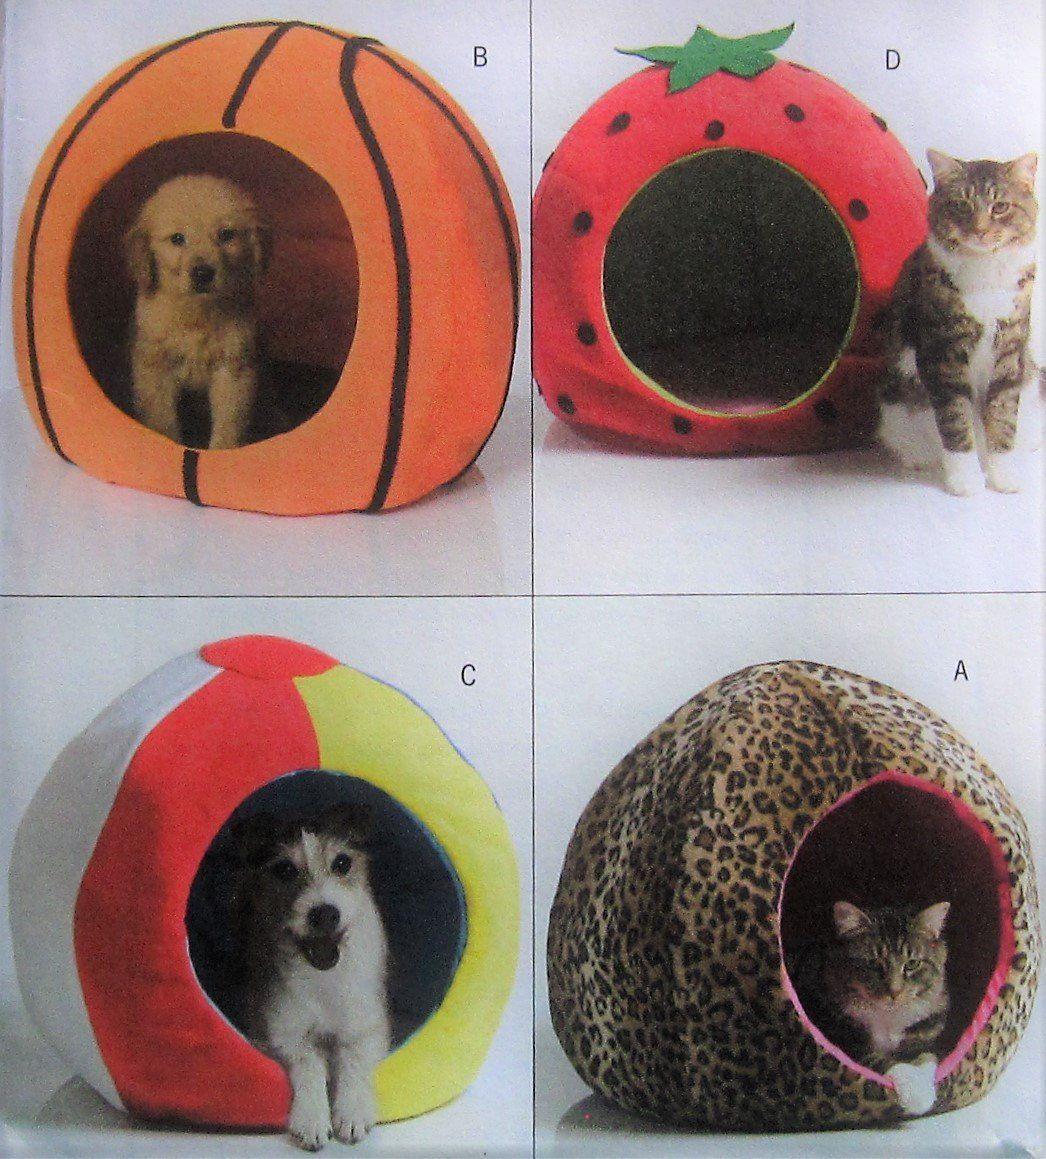 Pet Bed Sewing Pattern Butterick B4949 UNCUT cat dog beds